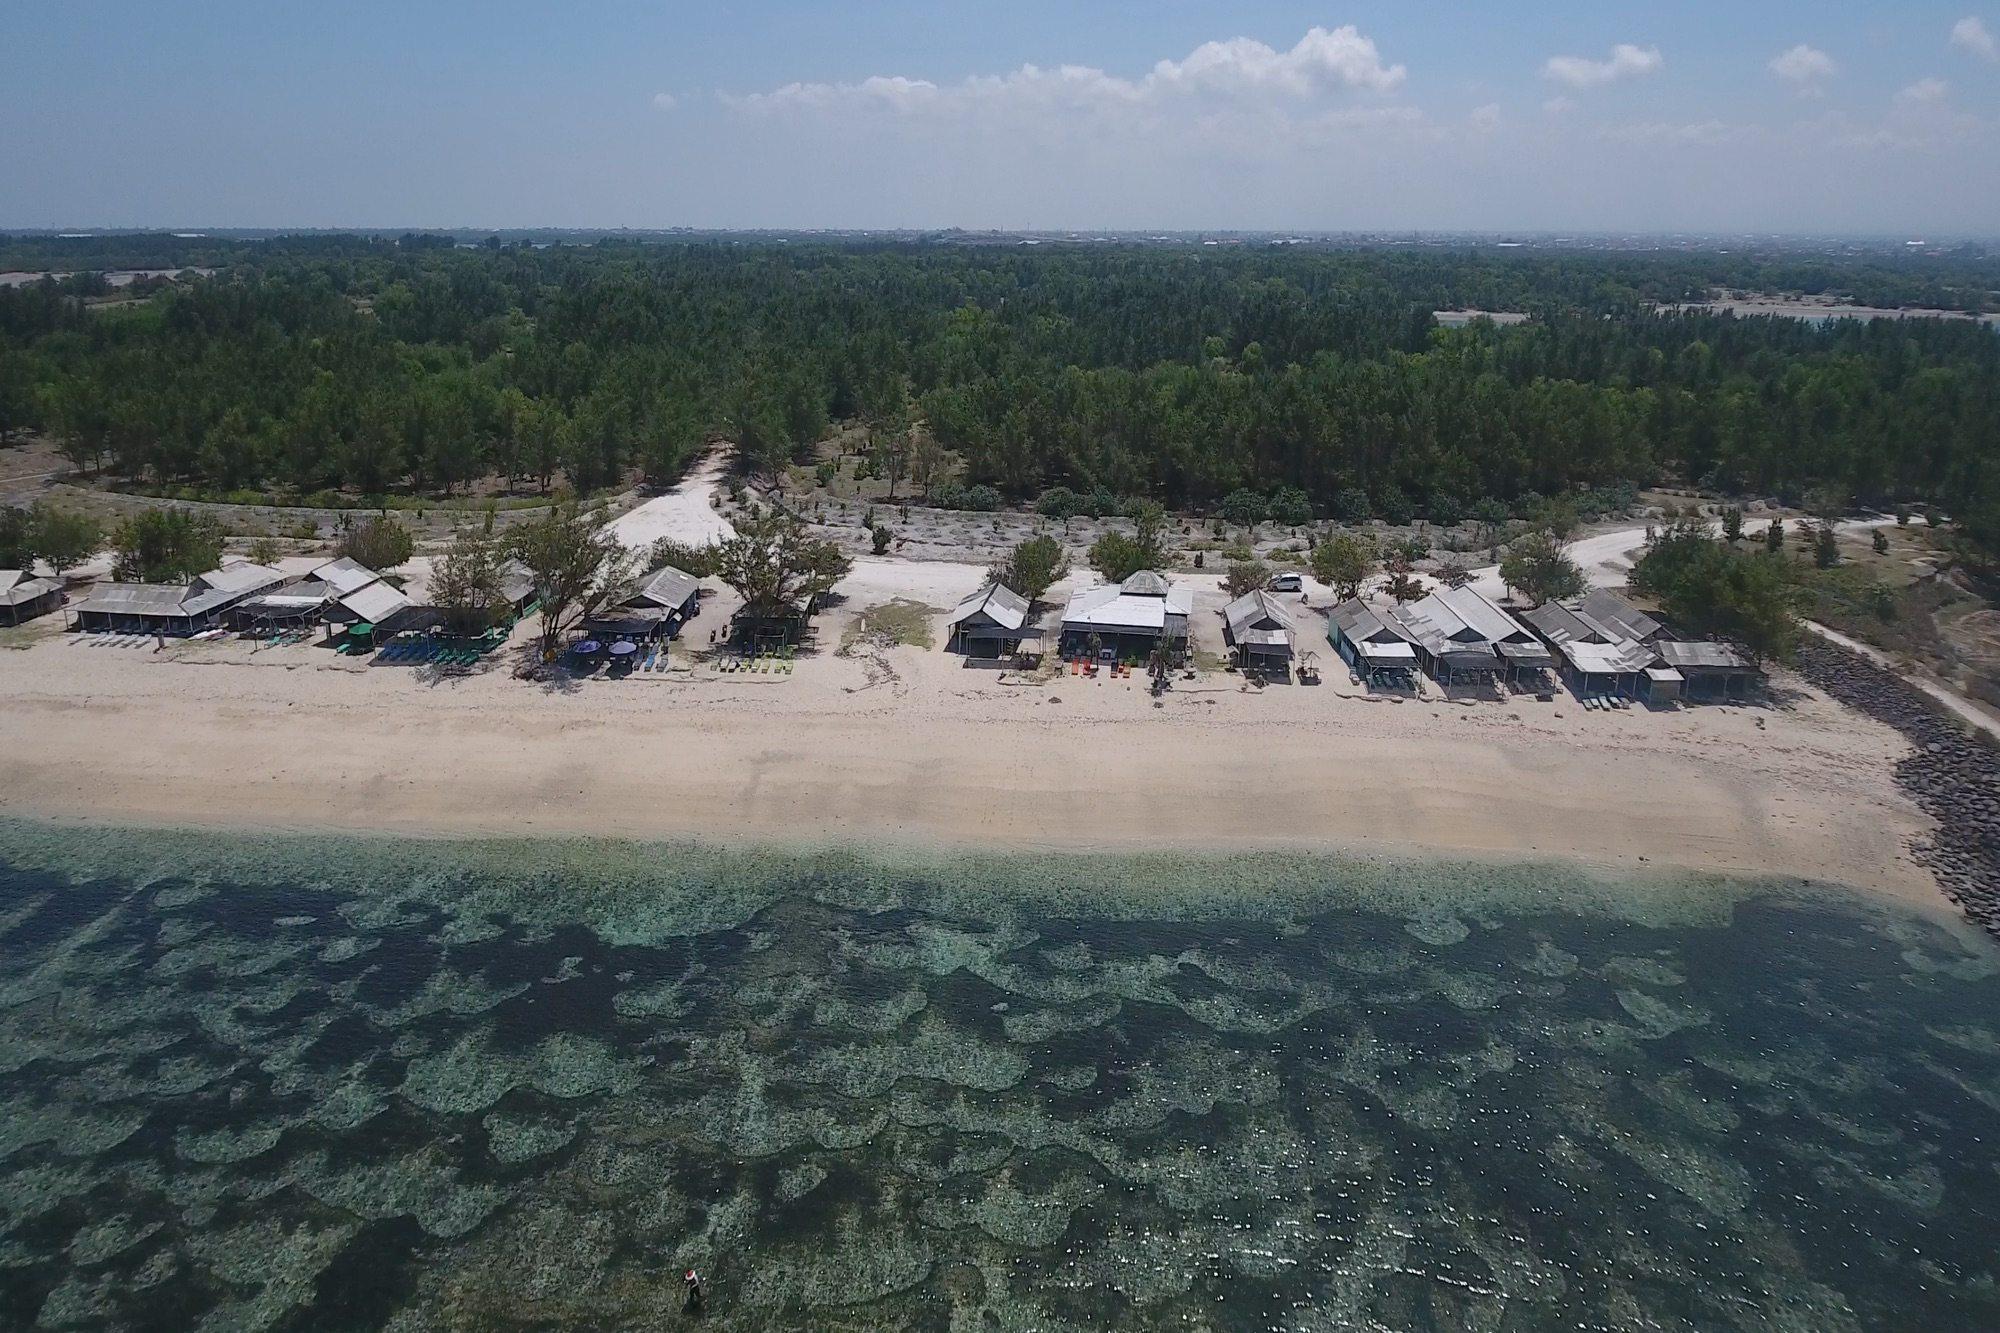 Undiscovered Bali: Serangan Turtle Island